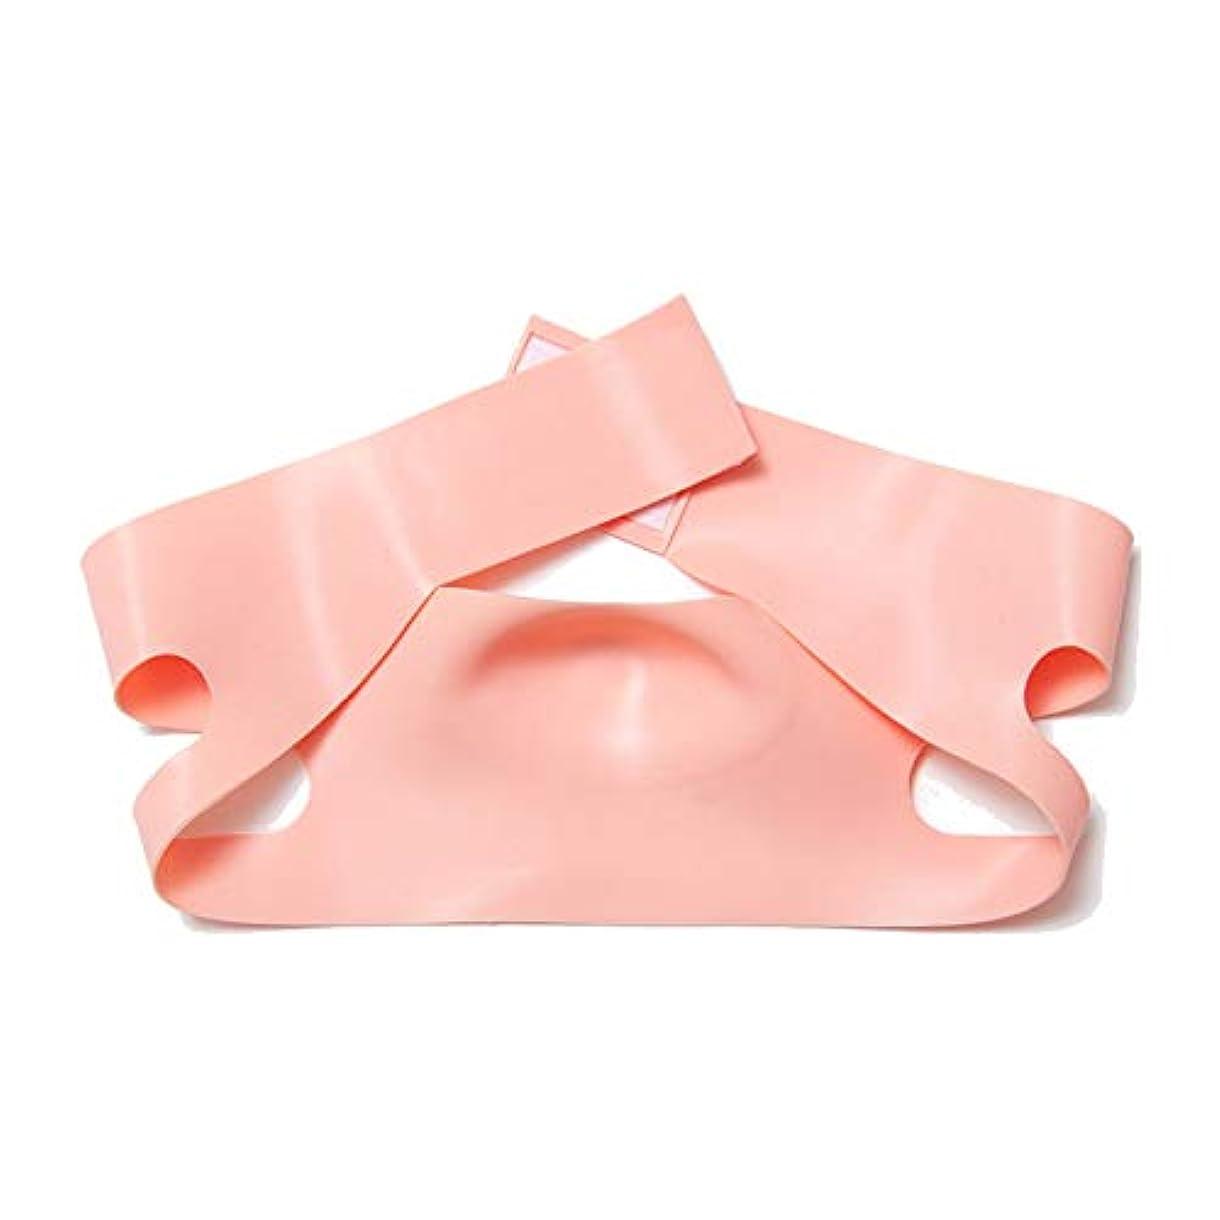 TLMY 薄いフェイスマスクあご付きシリコーンVマスクマスク強い包帯V顔アーティファクト小さなV顔包帯フェイシャルとネックリフト 顔用整形マスク